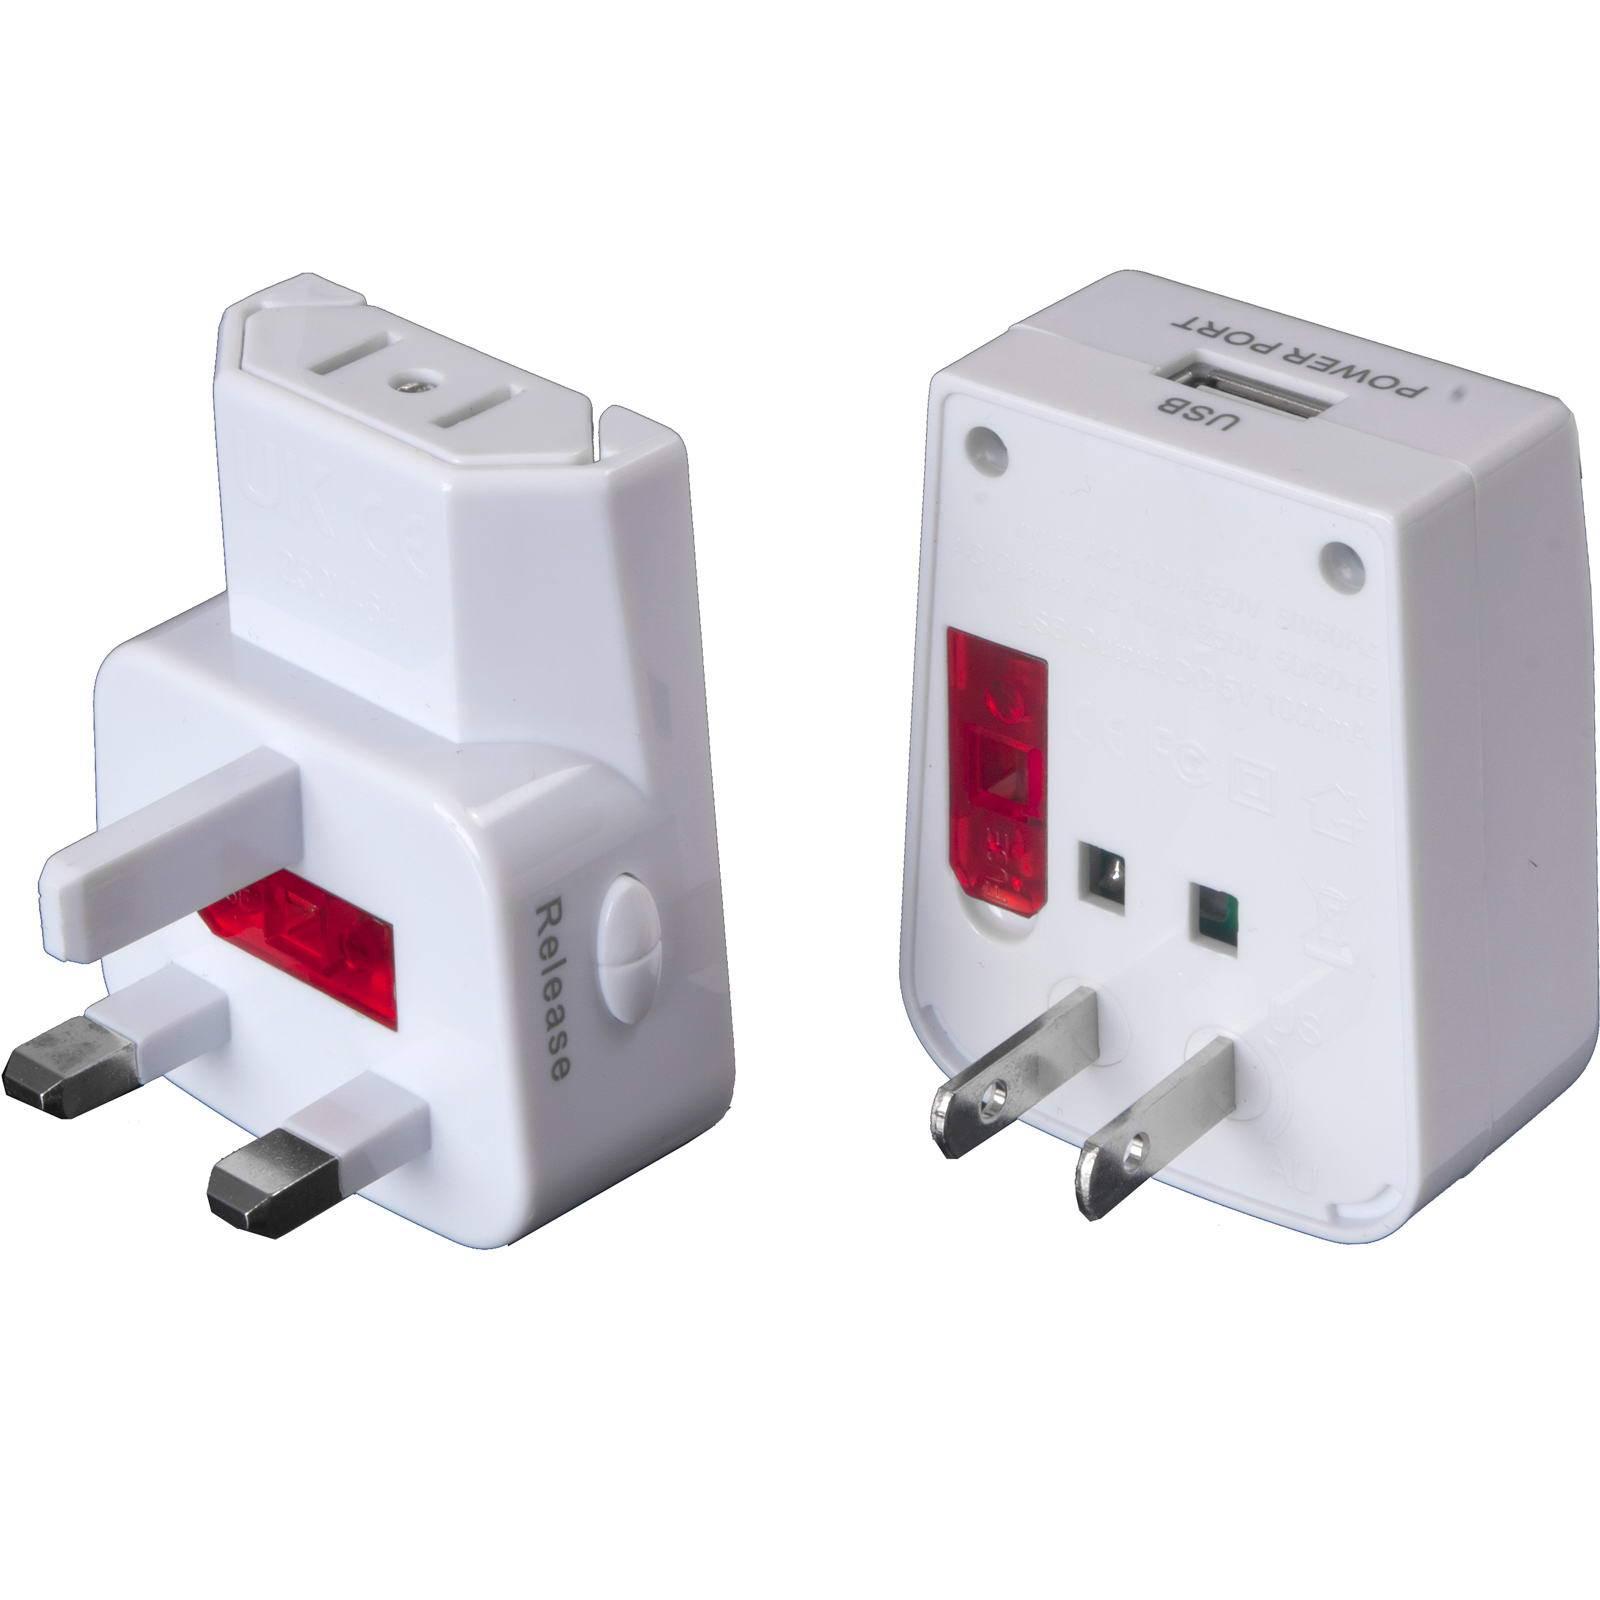 Relags Universal USB Steckeradapter - Bild 4